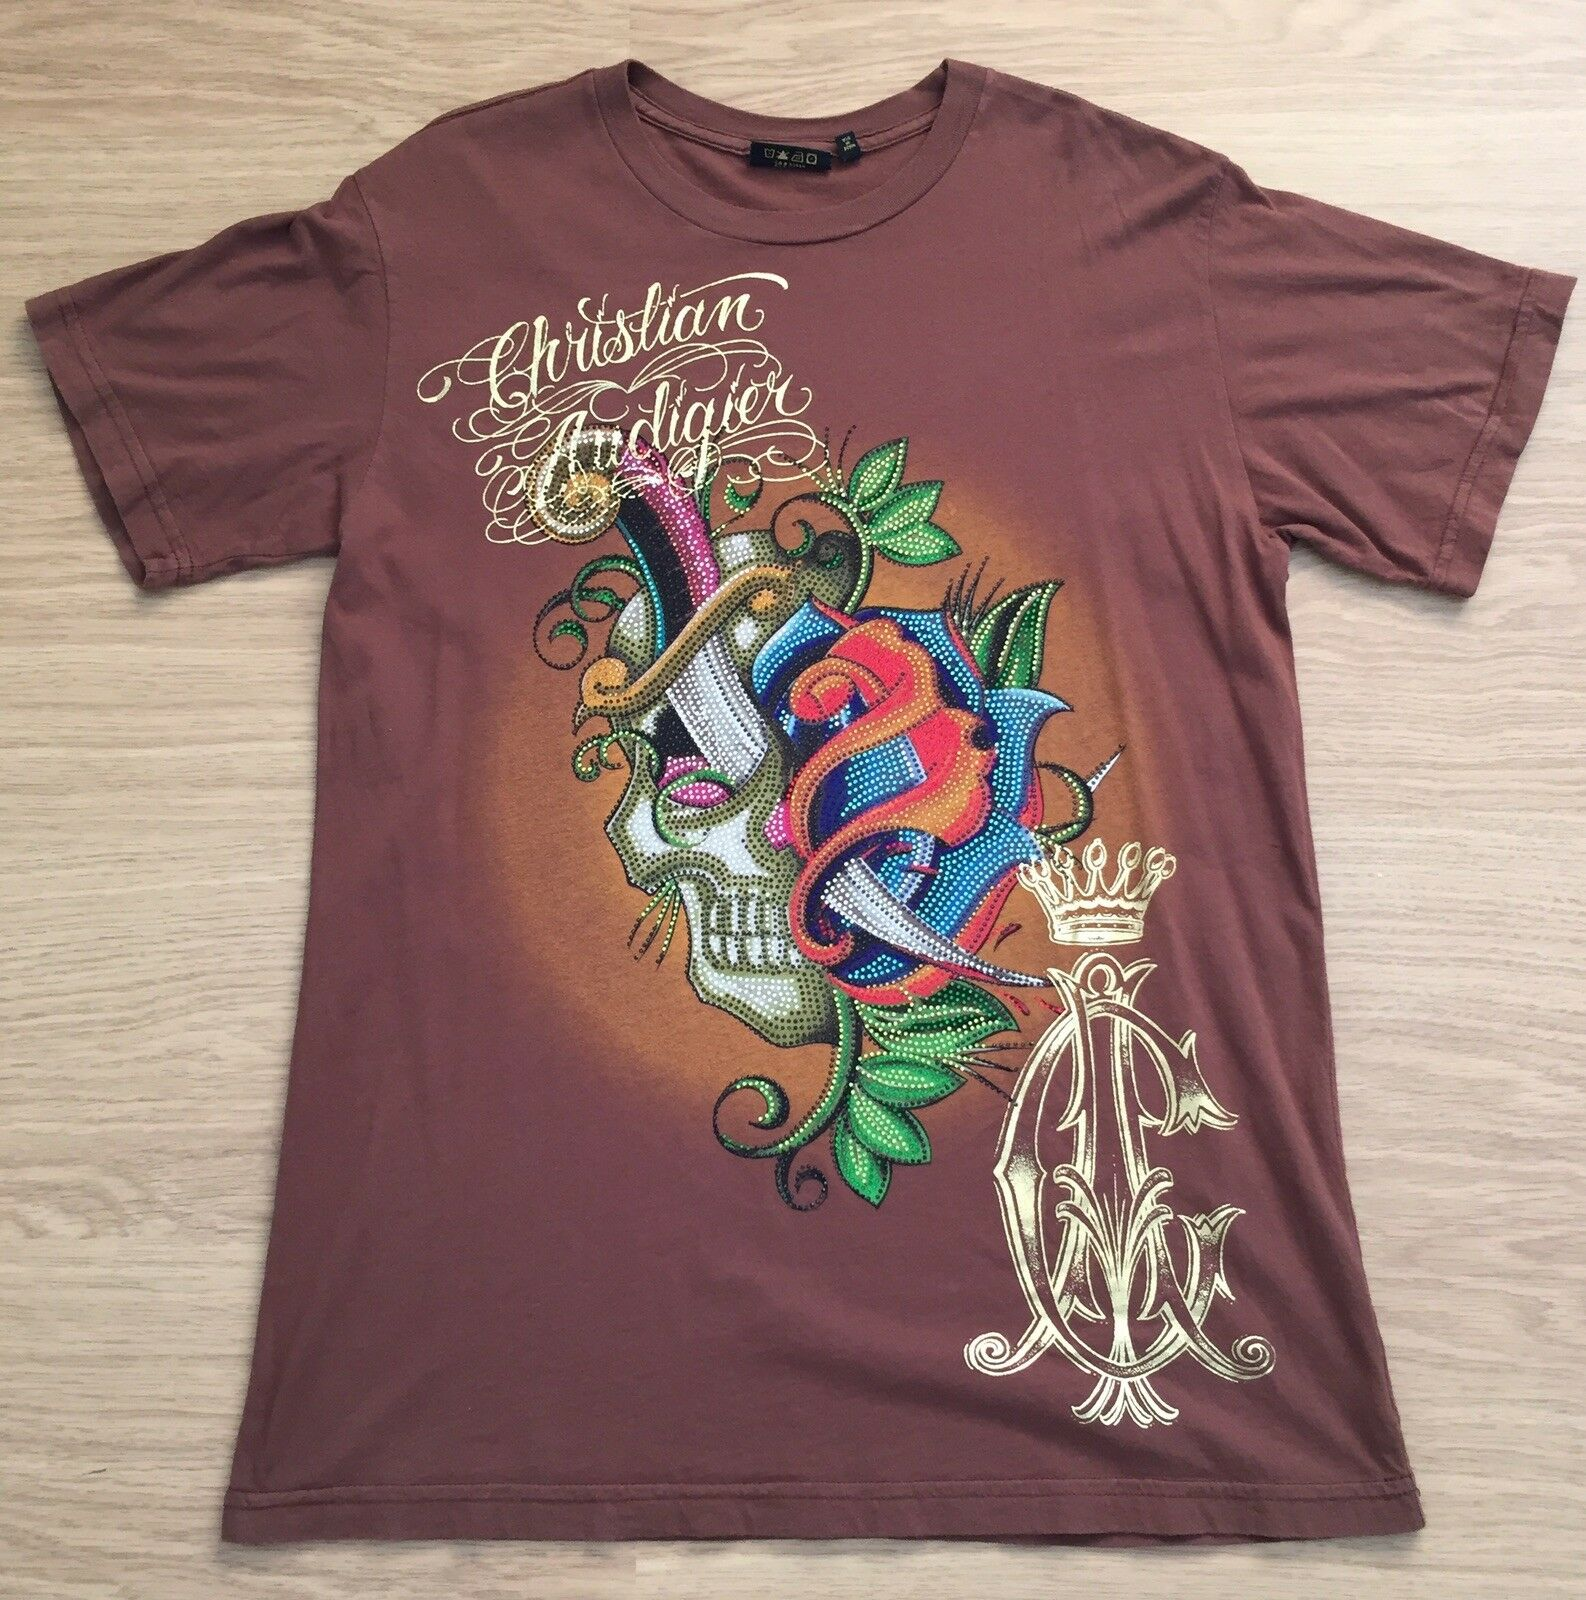 Twice Worn Men's Vintage Christian Audigier T-Shirt. Brown. Medium. RRP